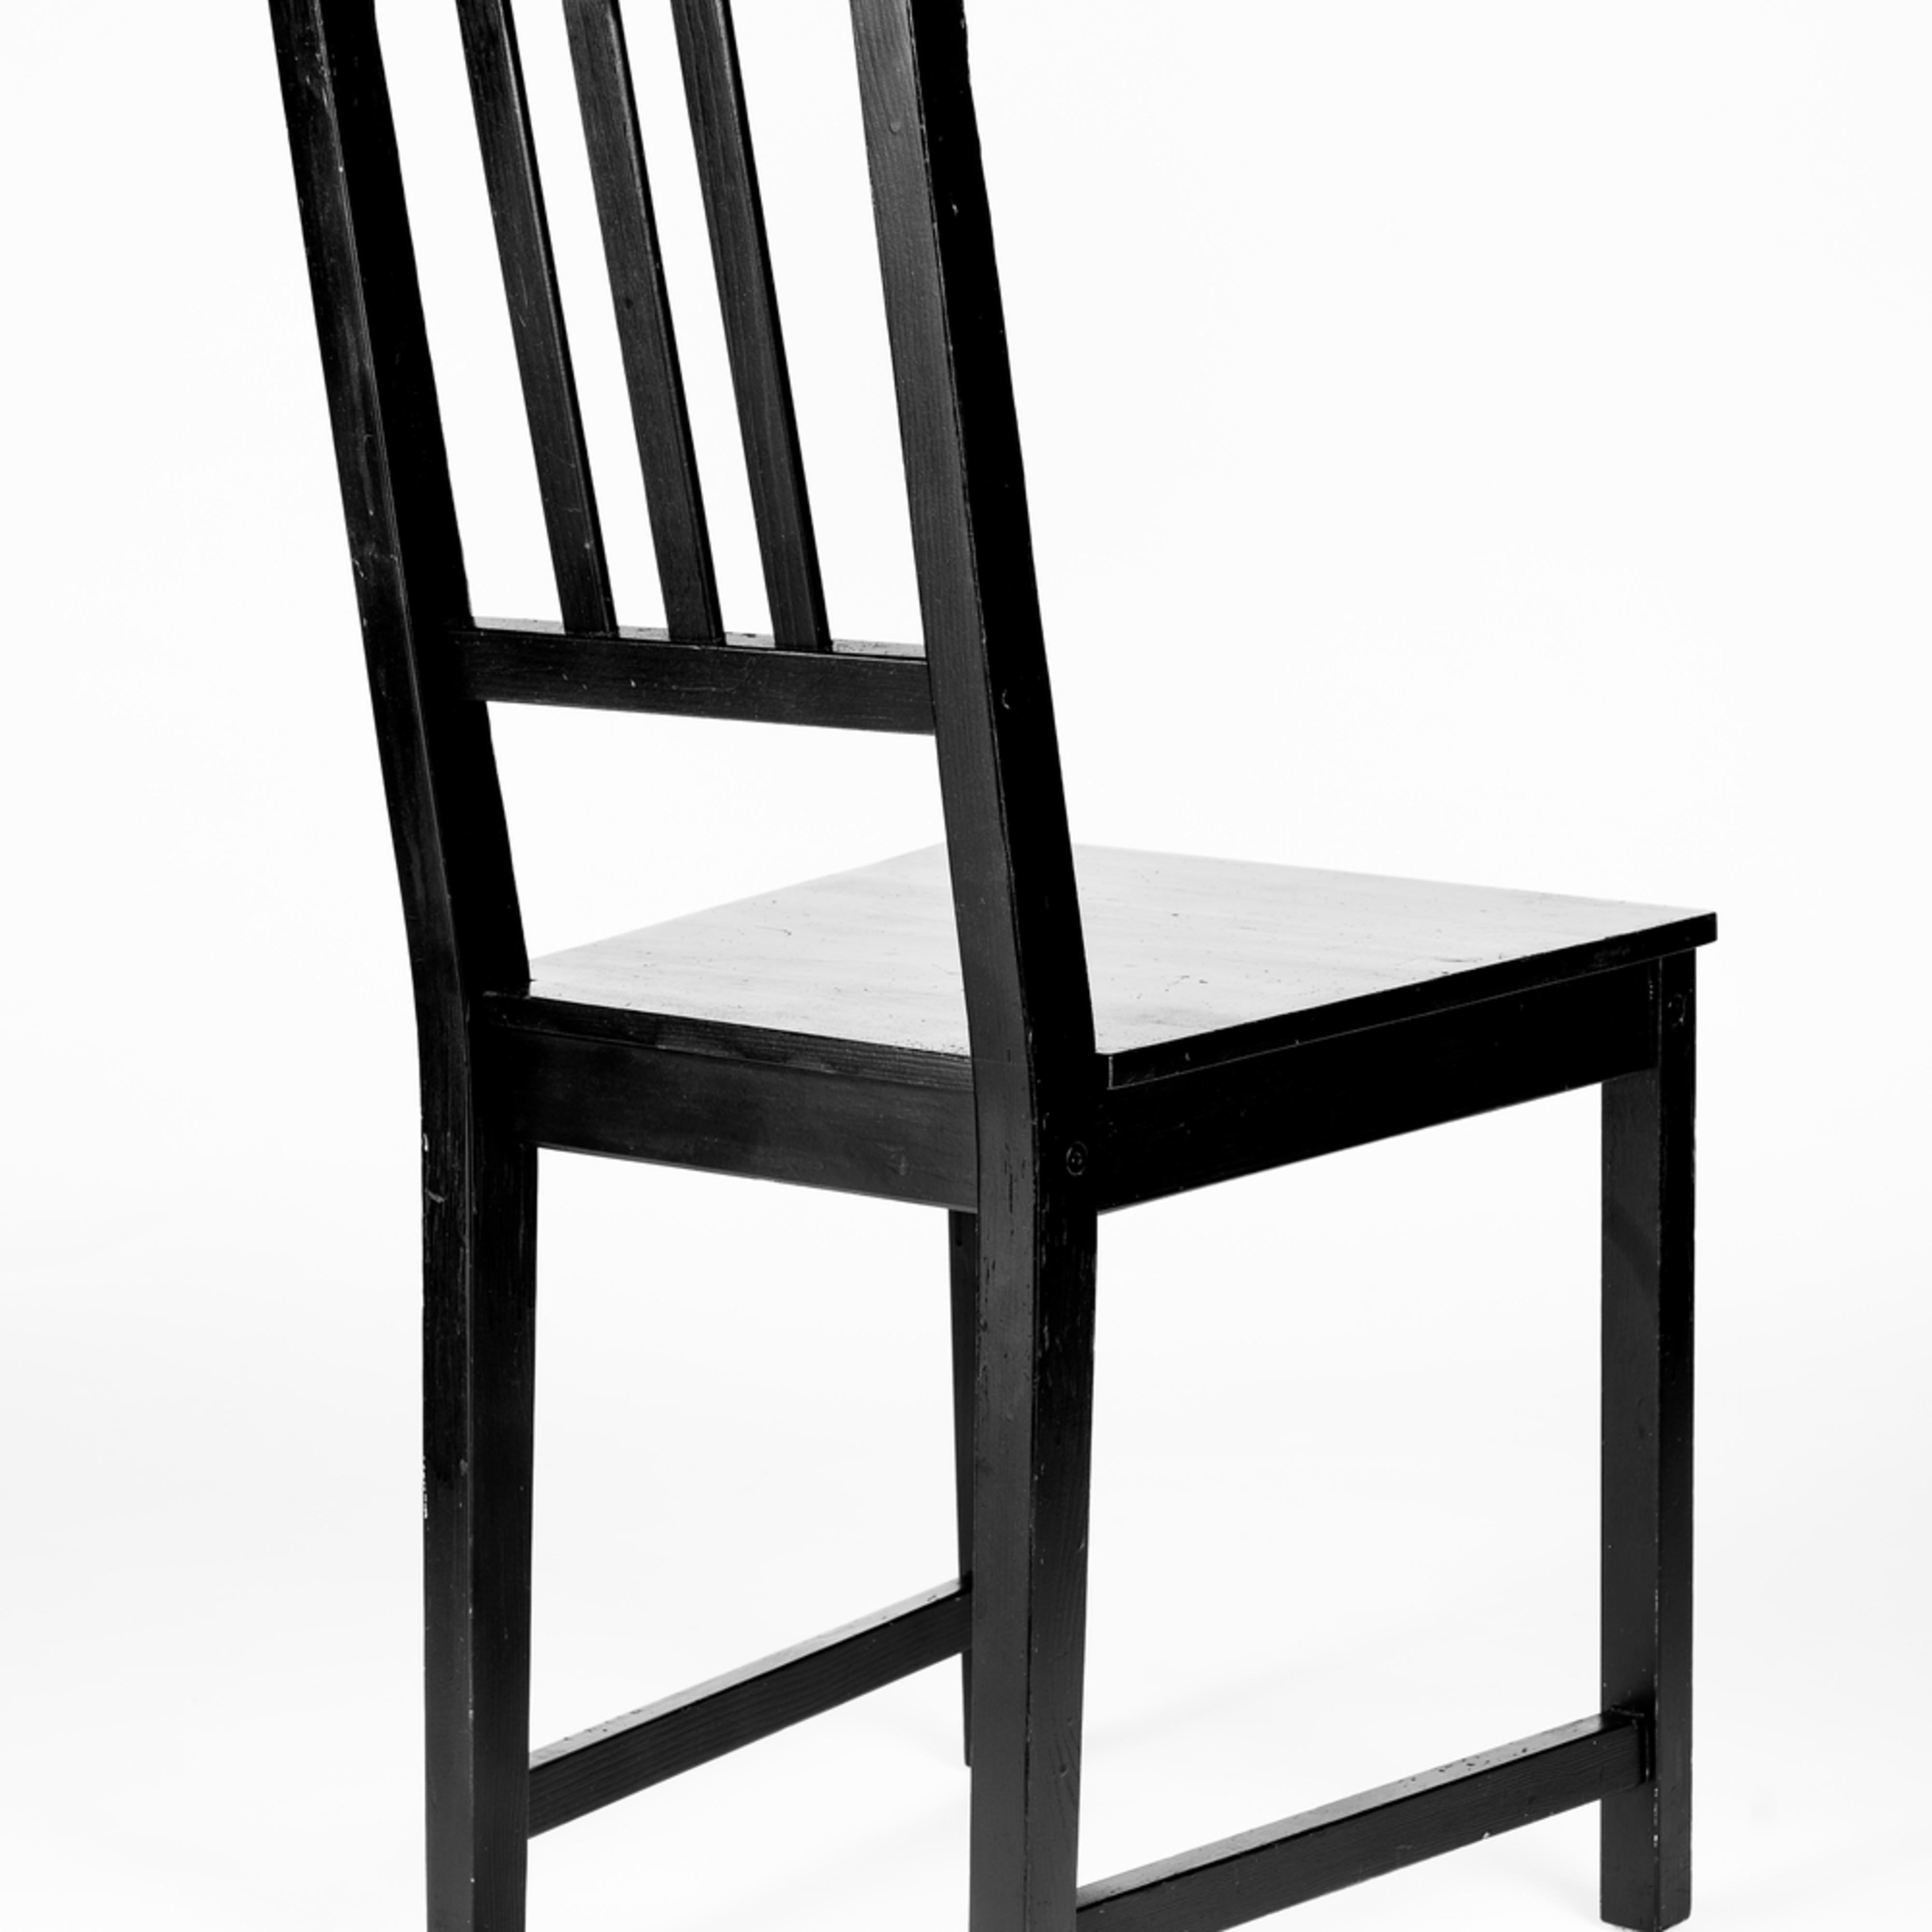 Chair 5 kothpg